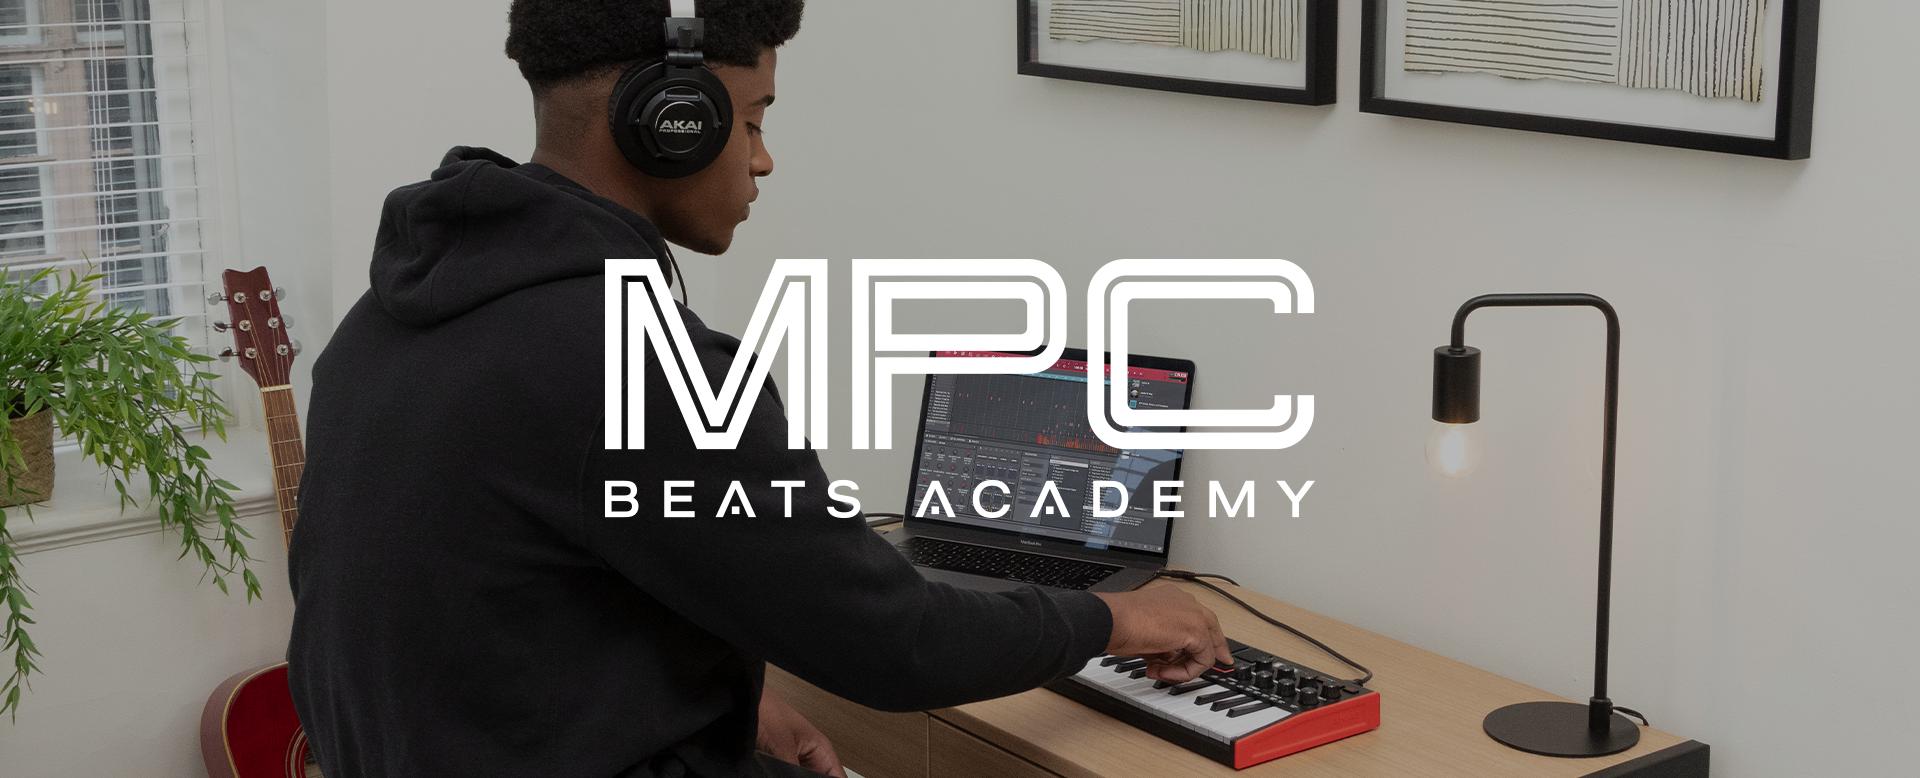 MPC Beats Academy